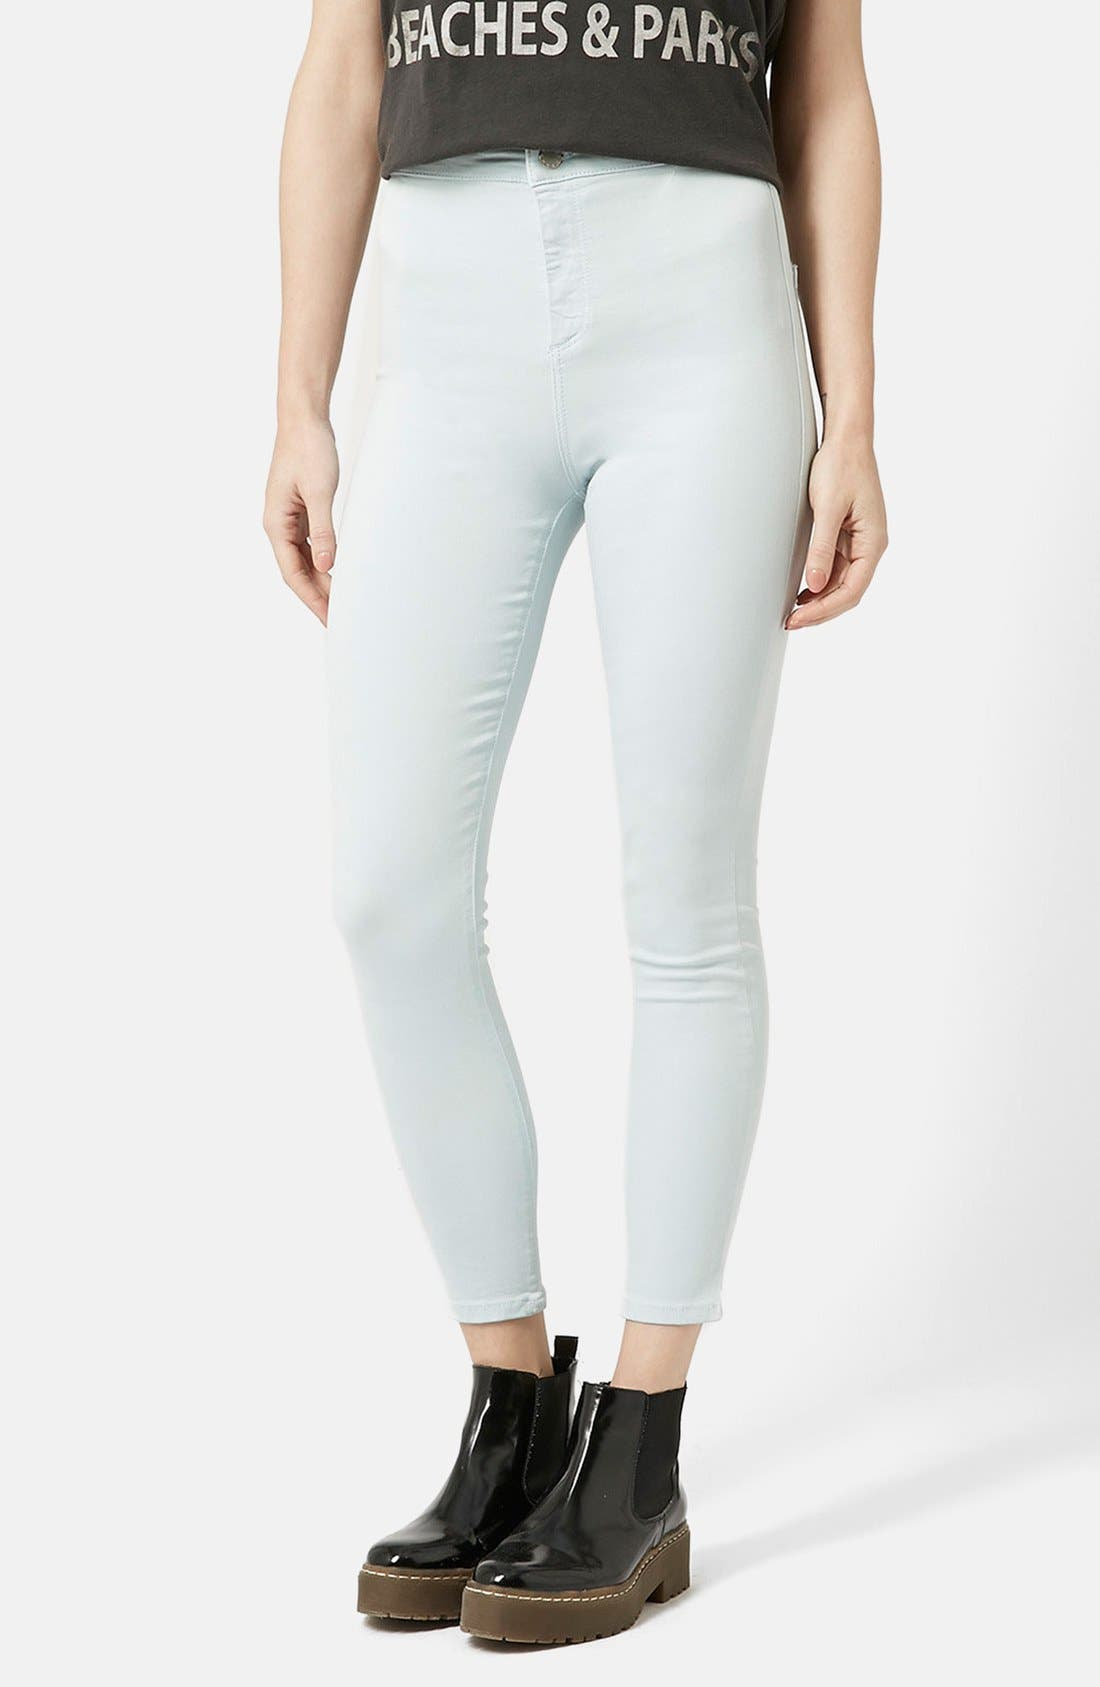 Alternate Image 1 Selected - Topshop Moto 'Joni' High Rise Jeans (Light Blue) (Regular & Short)